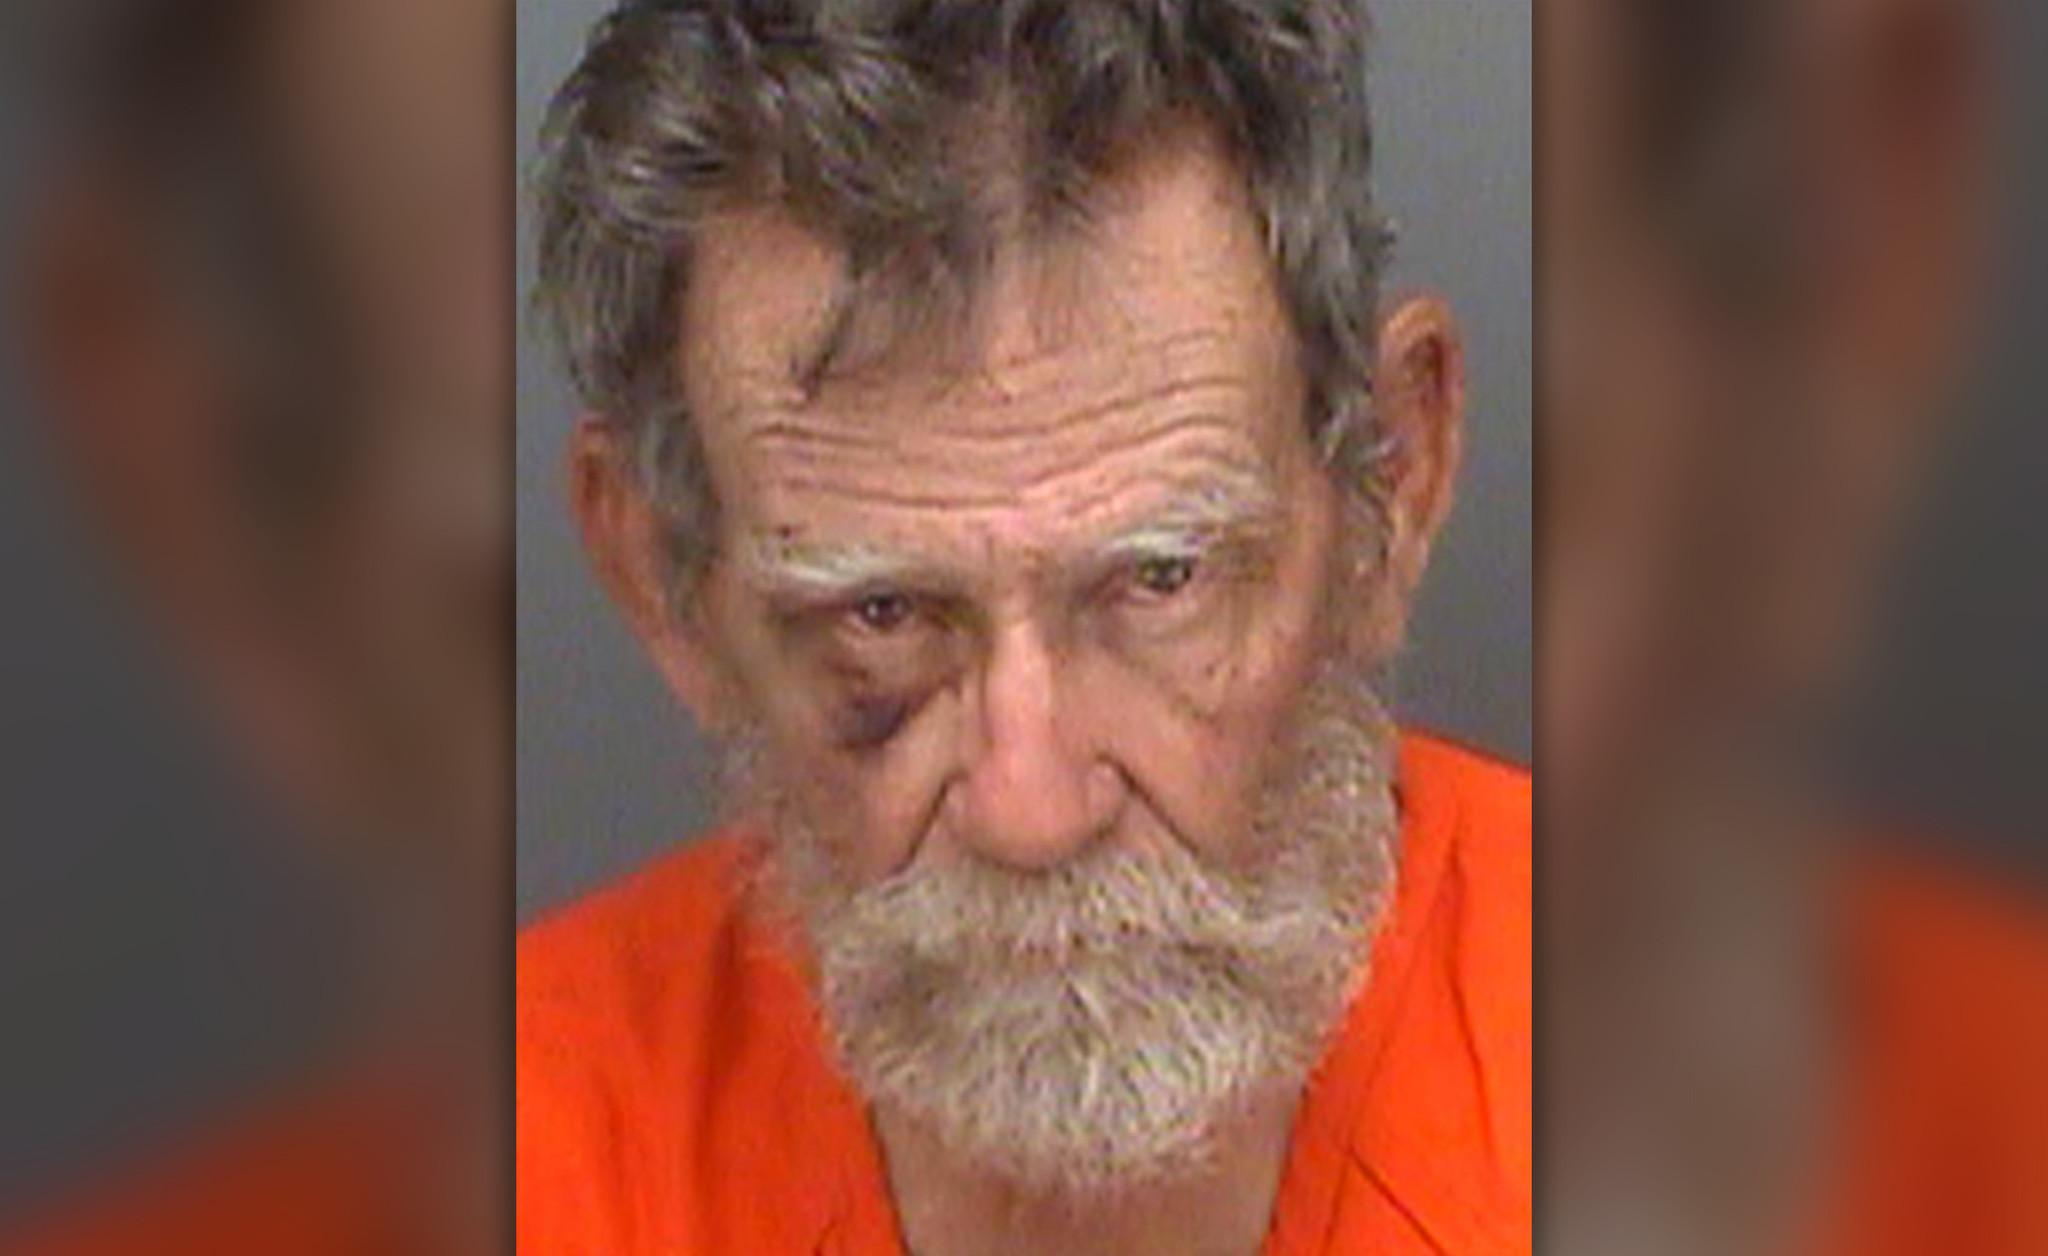 Florida man steals truck, blames coronavirus: cops